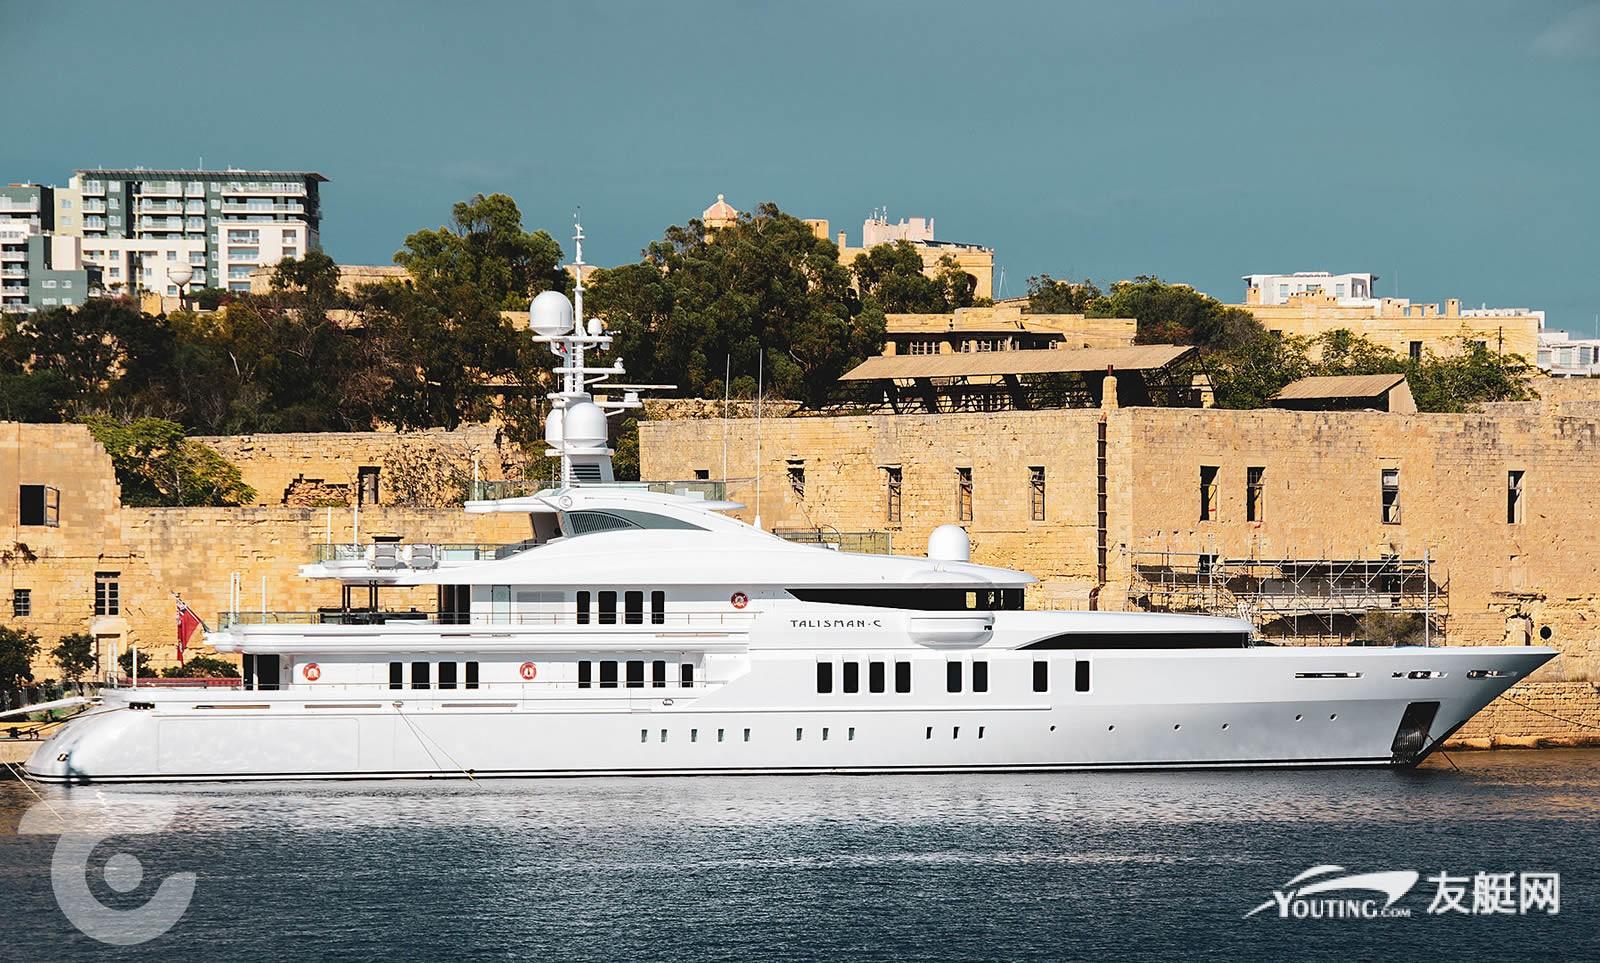 Turquoise Yachts 超艇 Talisman C